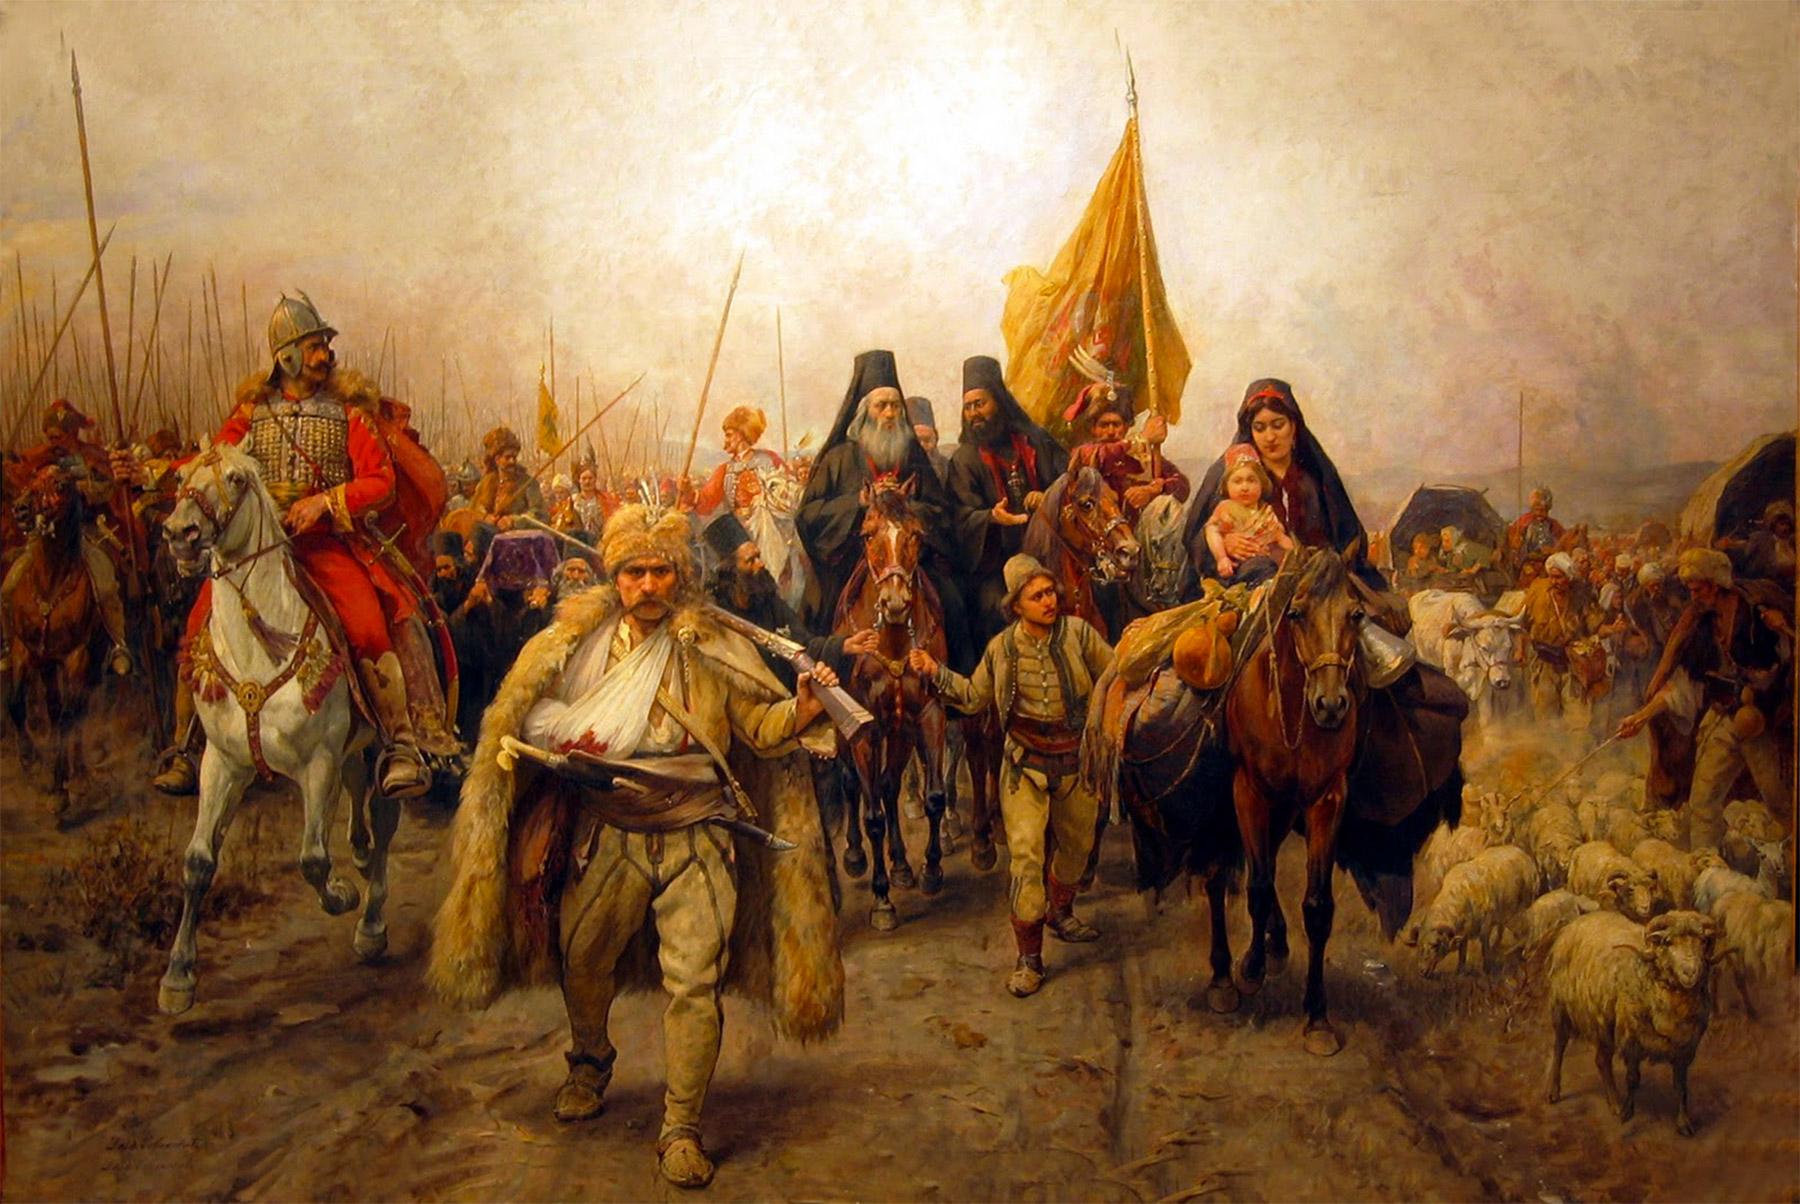 Paja Jovanović (1859–1957), La migration des Serbes (1690), huile sur toile, 1896, Pančevo Museum.